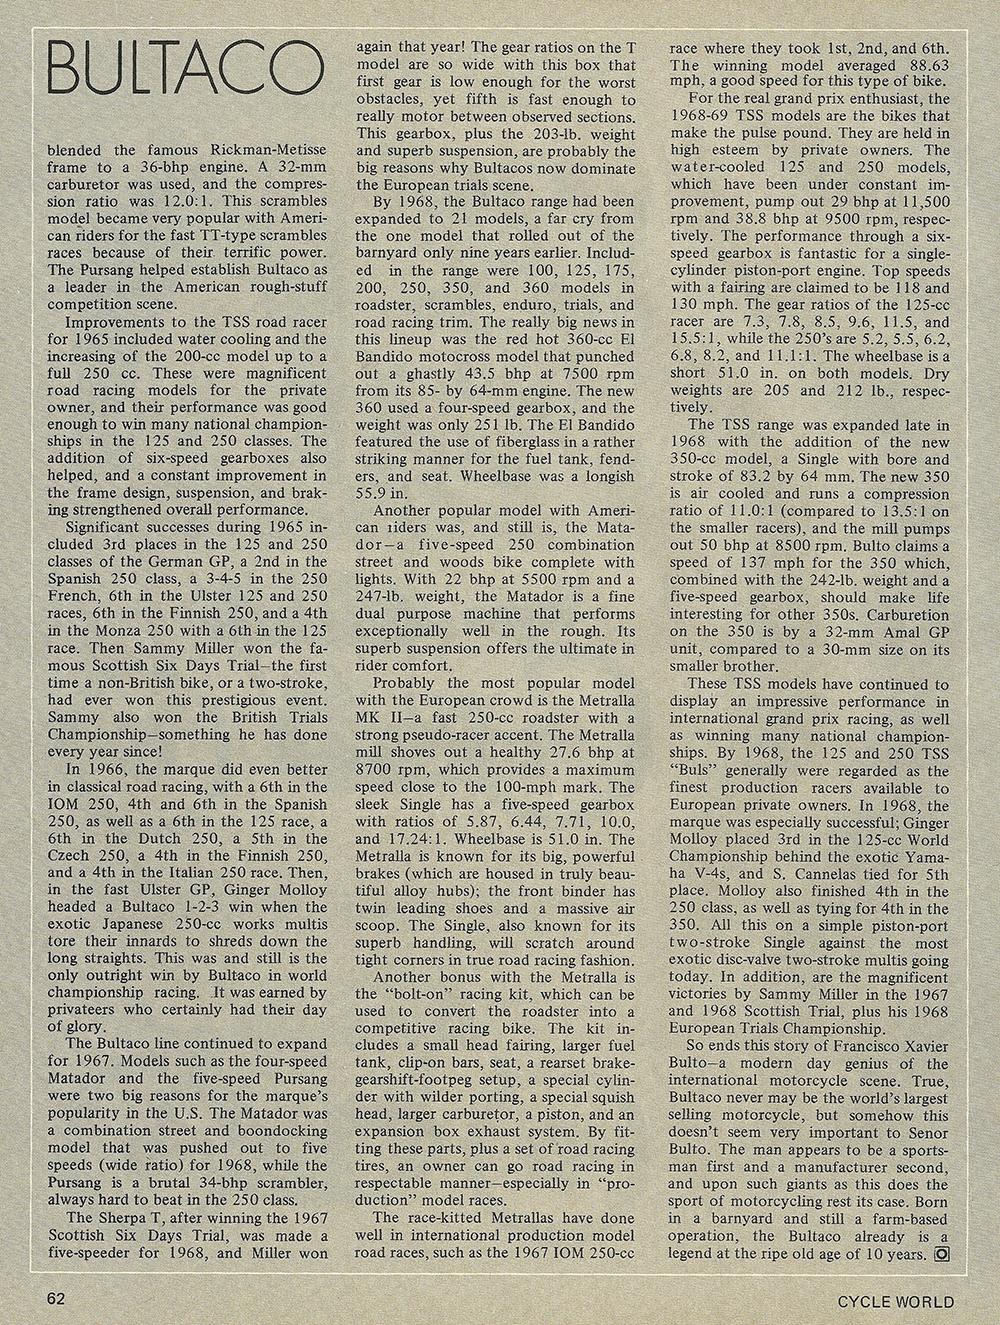 History of Bultaco 05.jpg